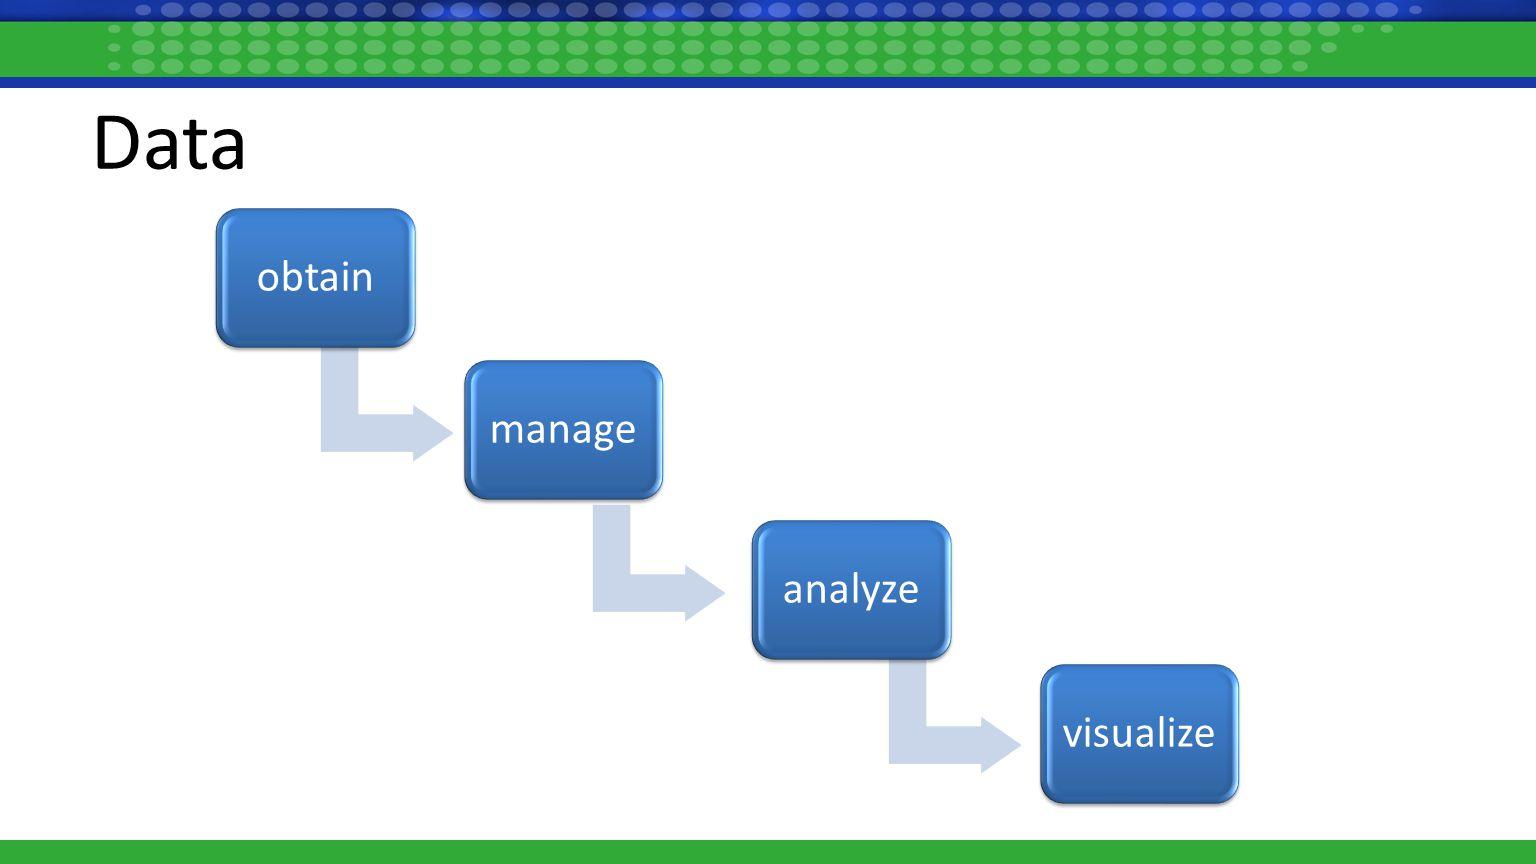 Workbook Analysis Report Excel Help – Analyze a workbook